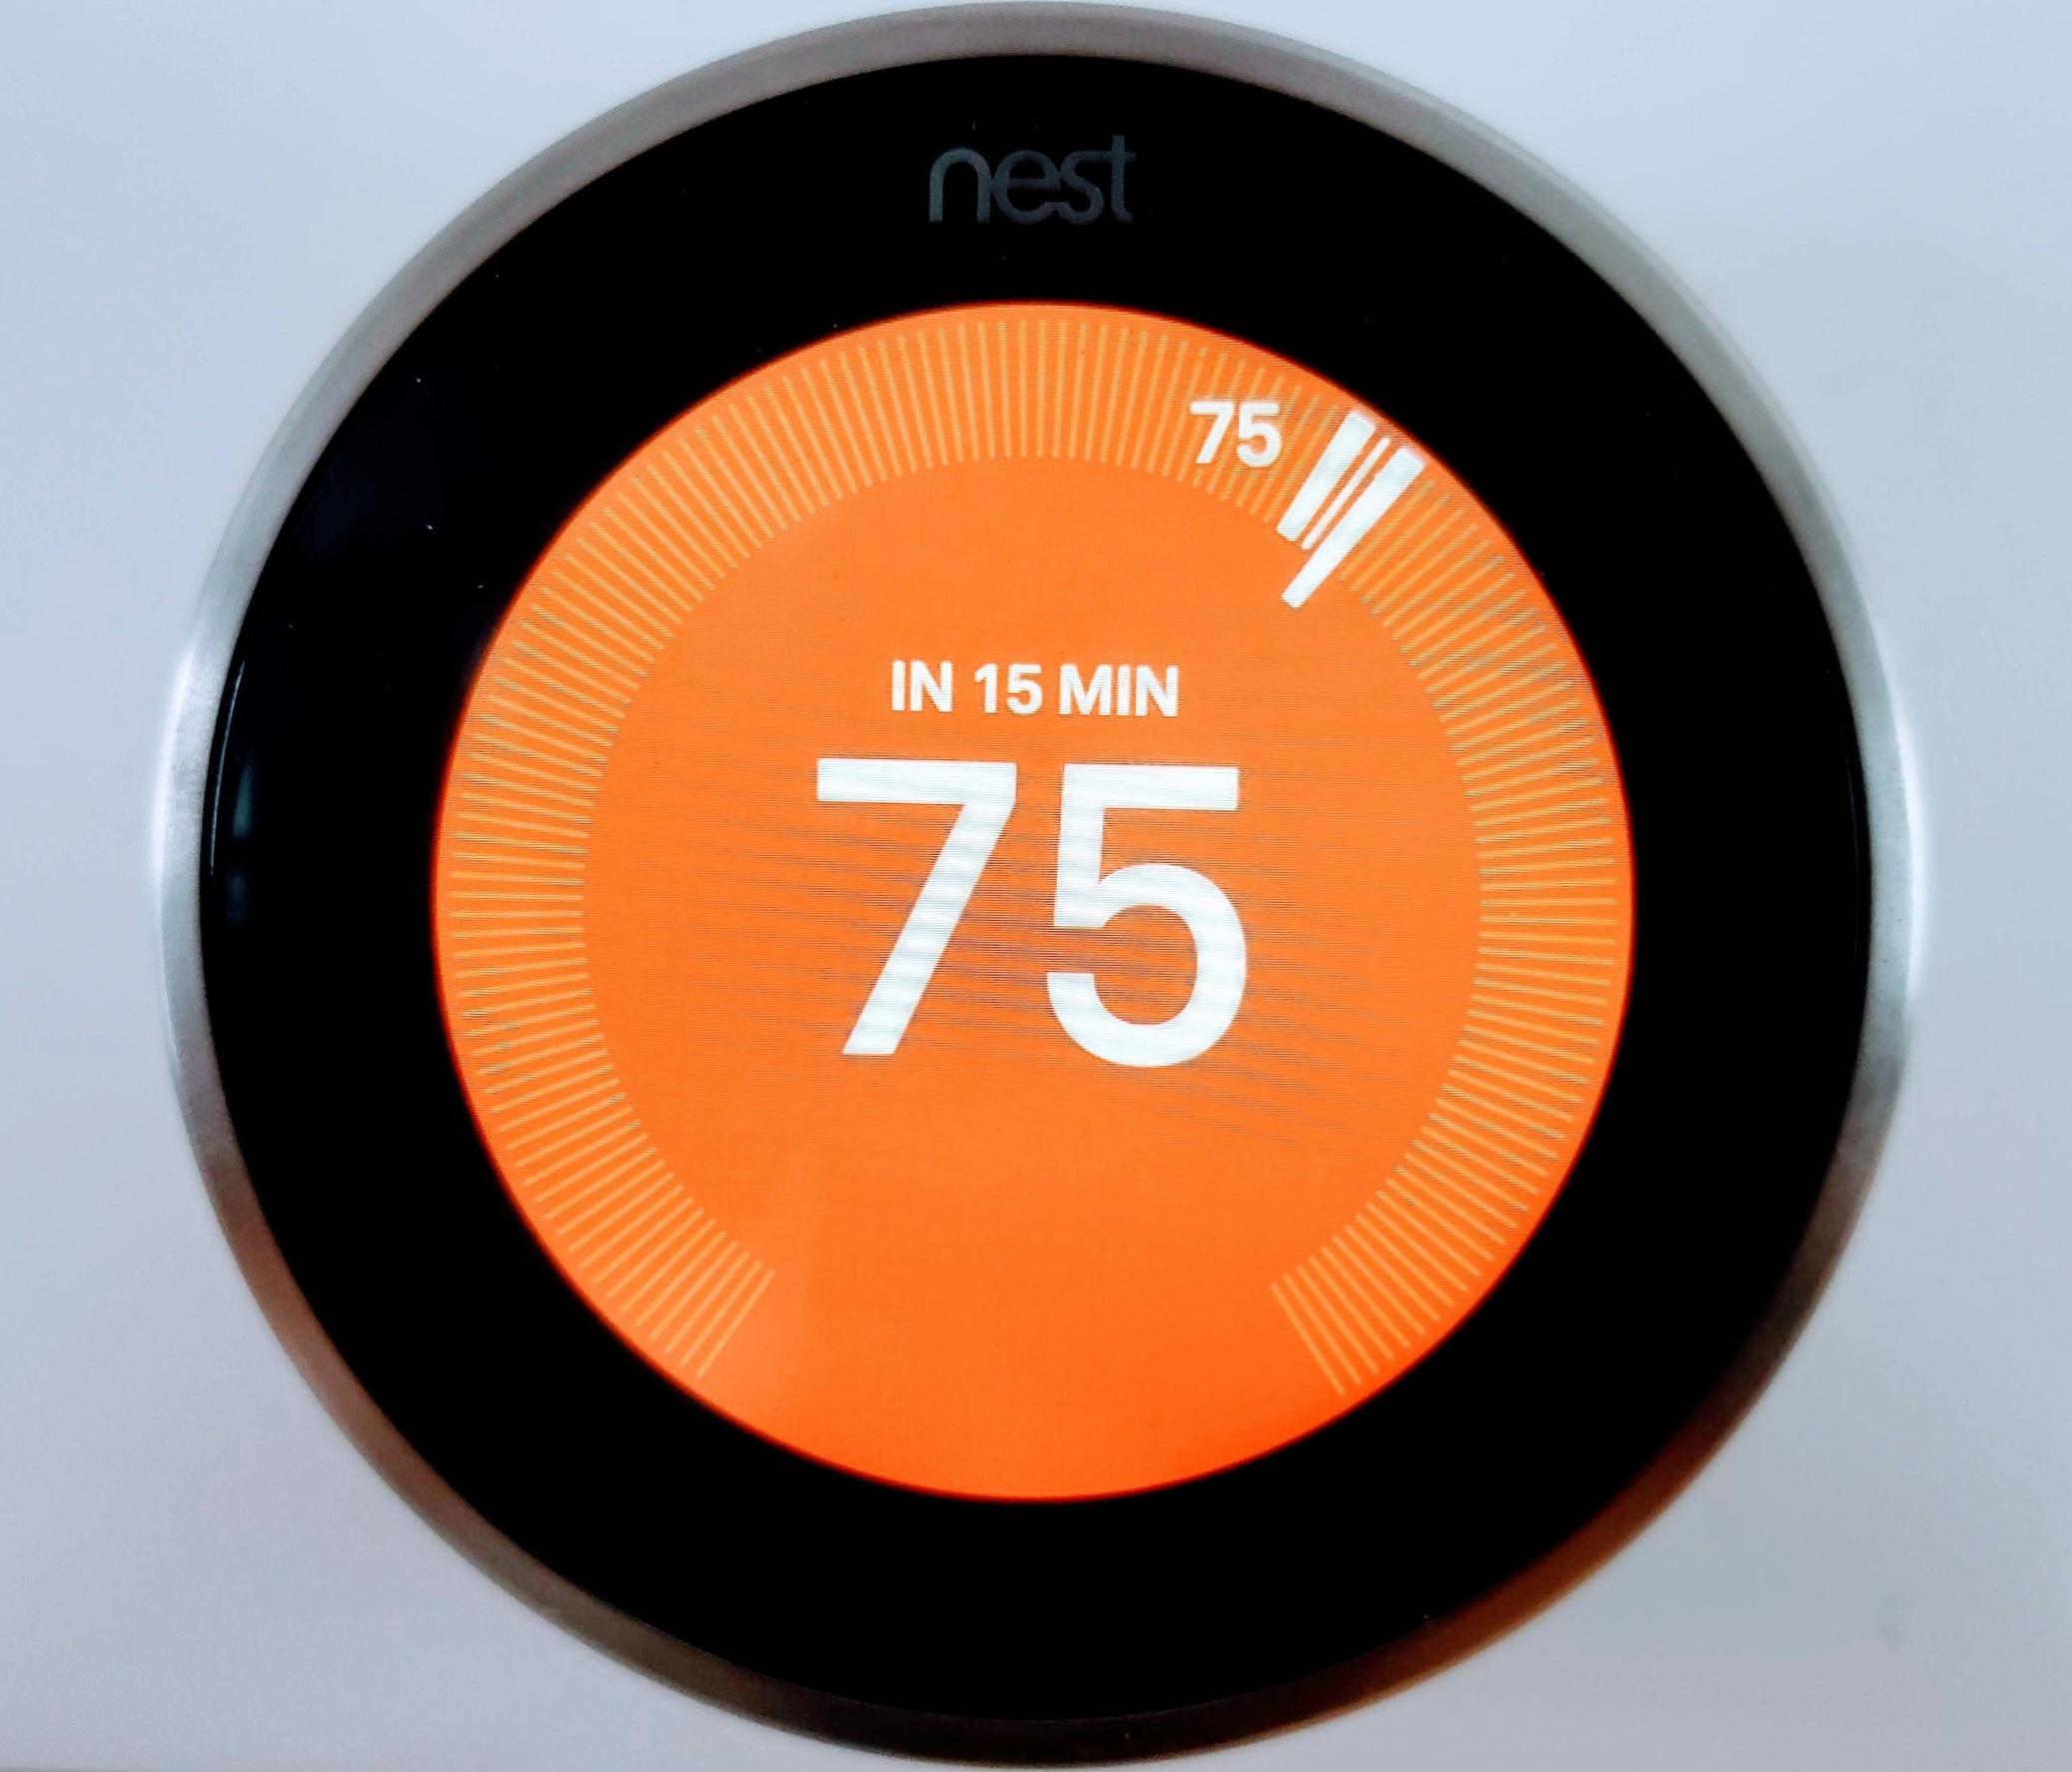 Nest vs Ecobee:  Nest Thermostat  In Heating Mode